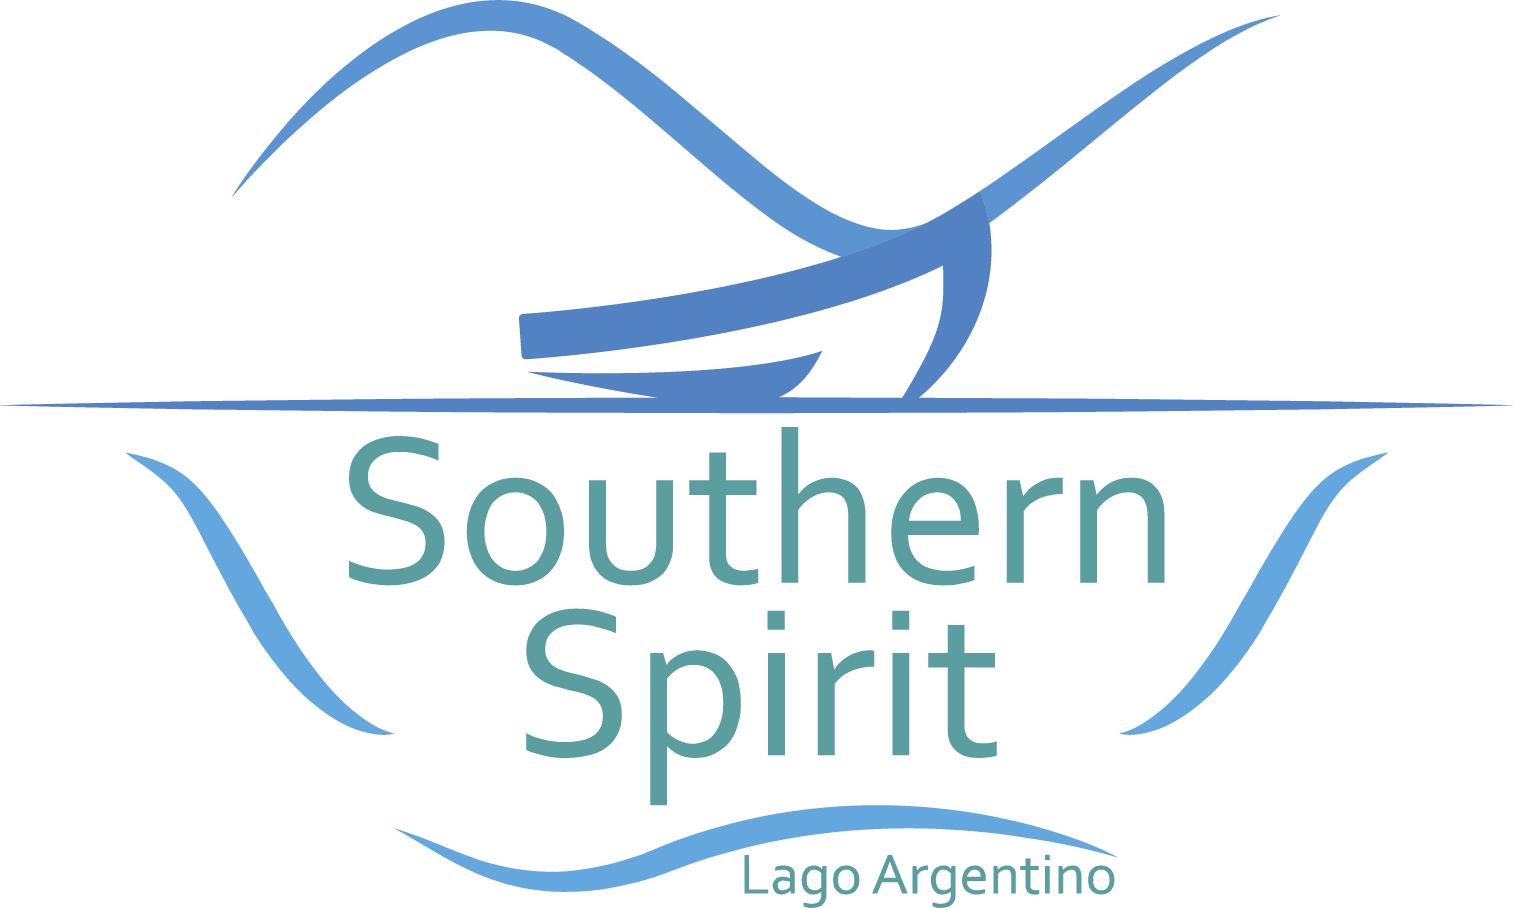 Southern Spirit